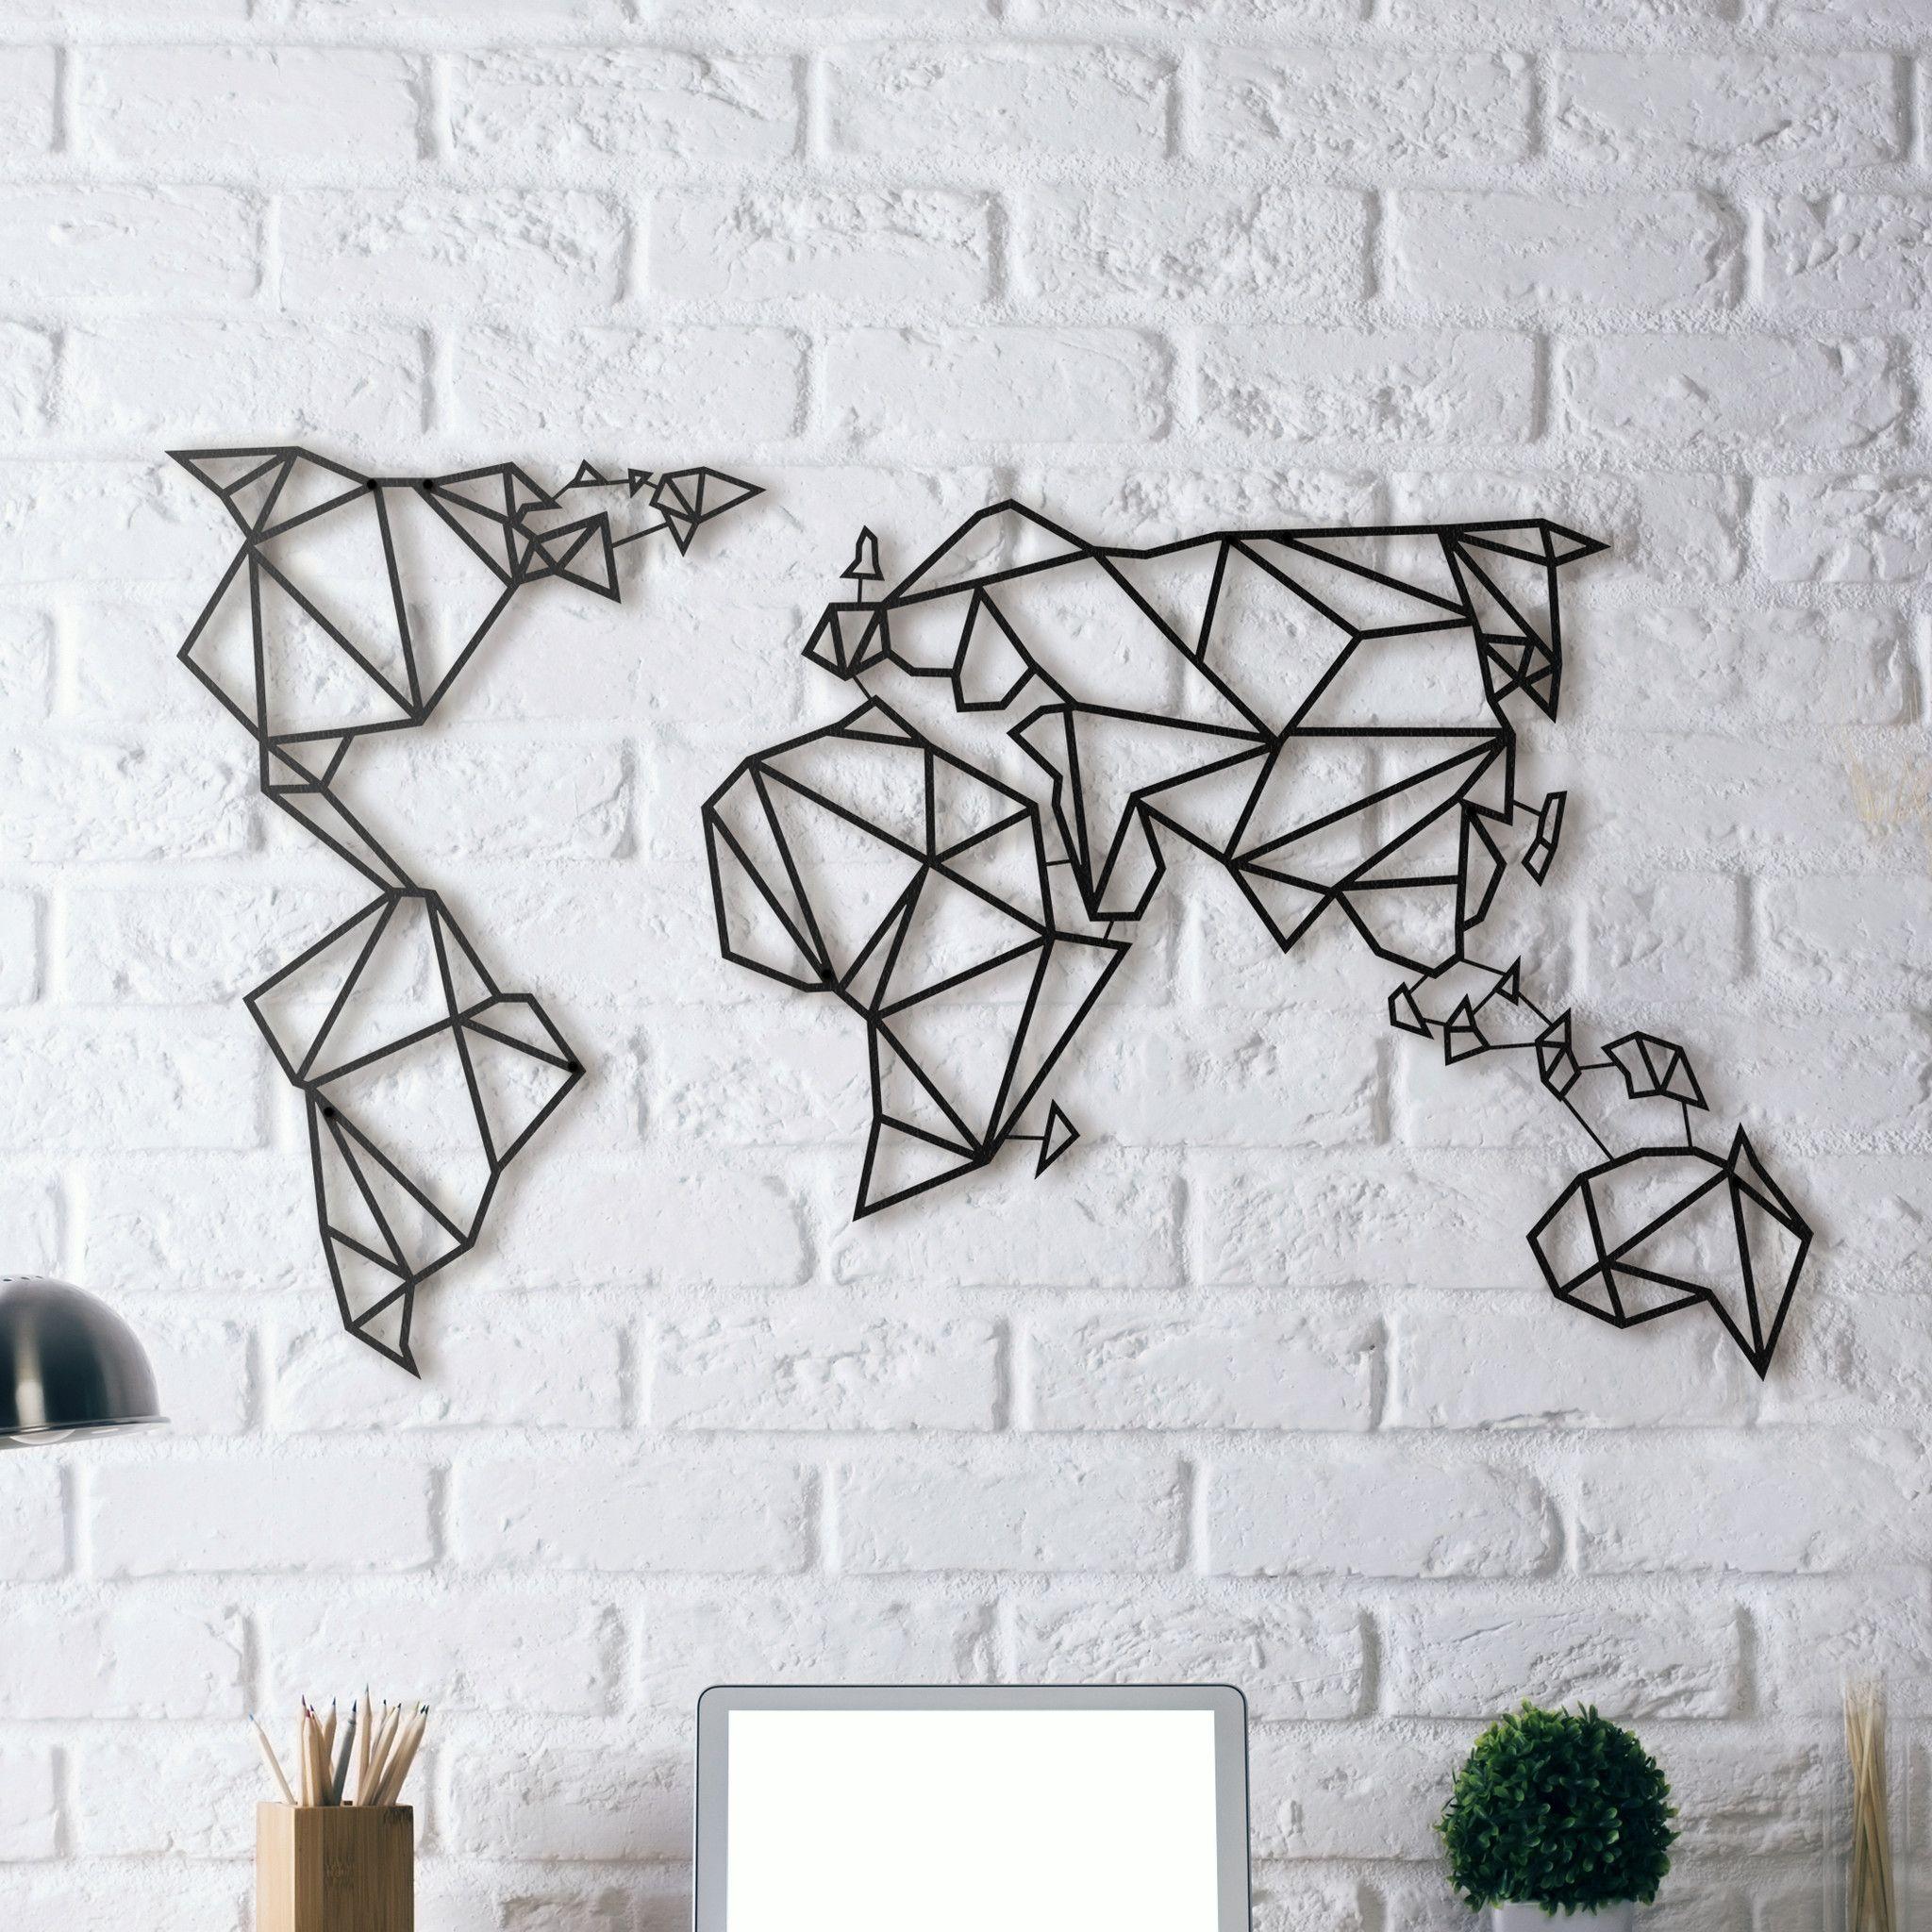 Yeni Metal Poster World Map Decoração Pinterest Shelves - Faded poster maps for sale us